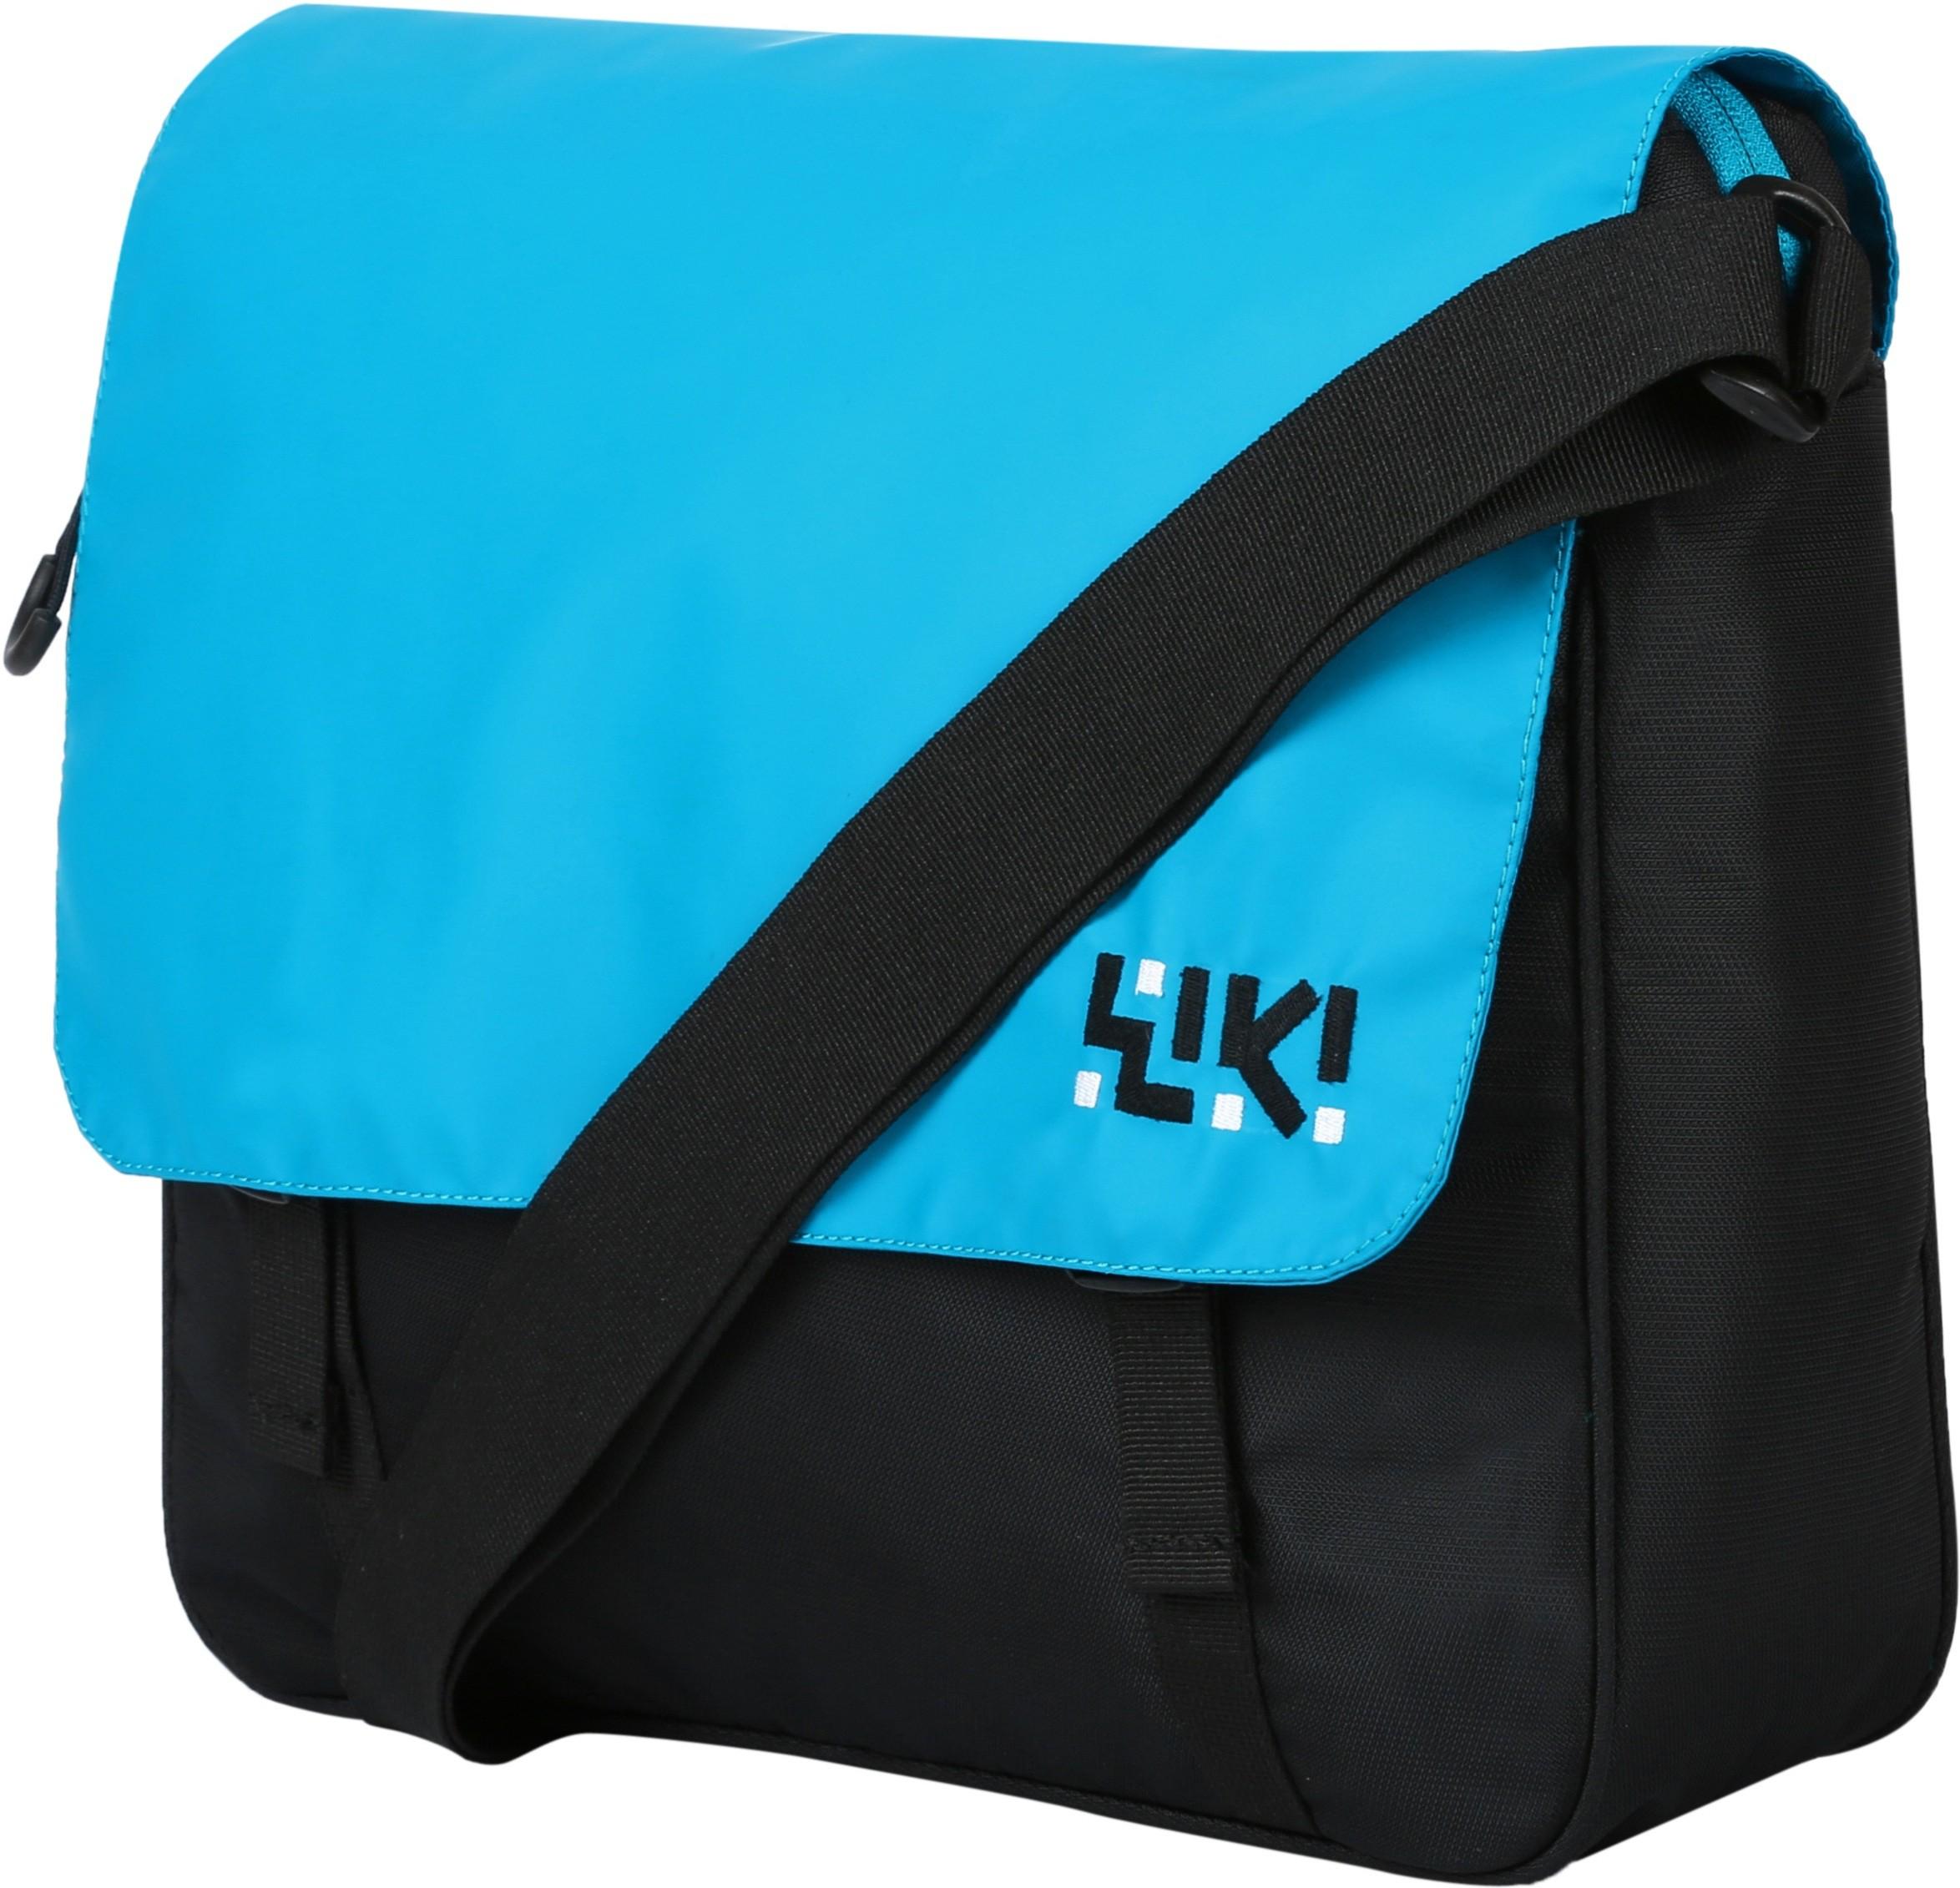 b1a659793 Wildcraft Women Casual Blue Nylon Sling BagWildcraft Women Casual Blue  Nylon Sling Bag